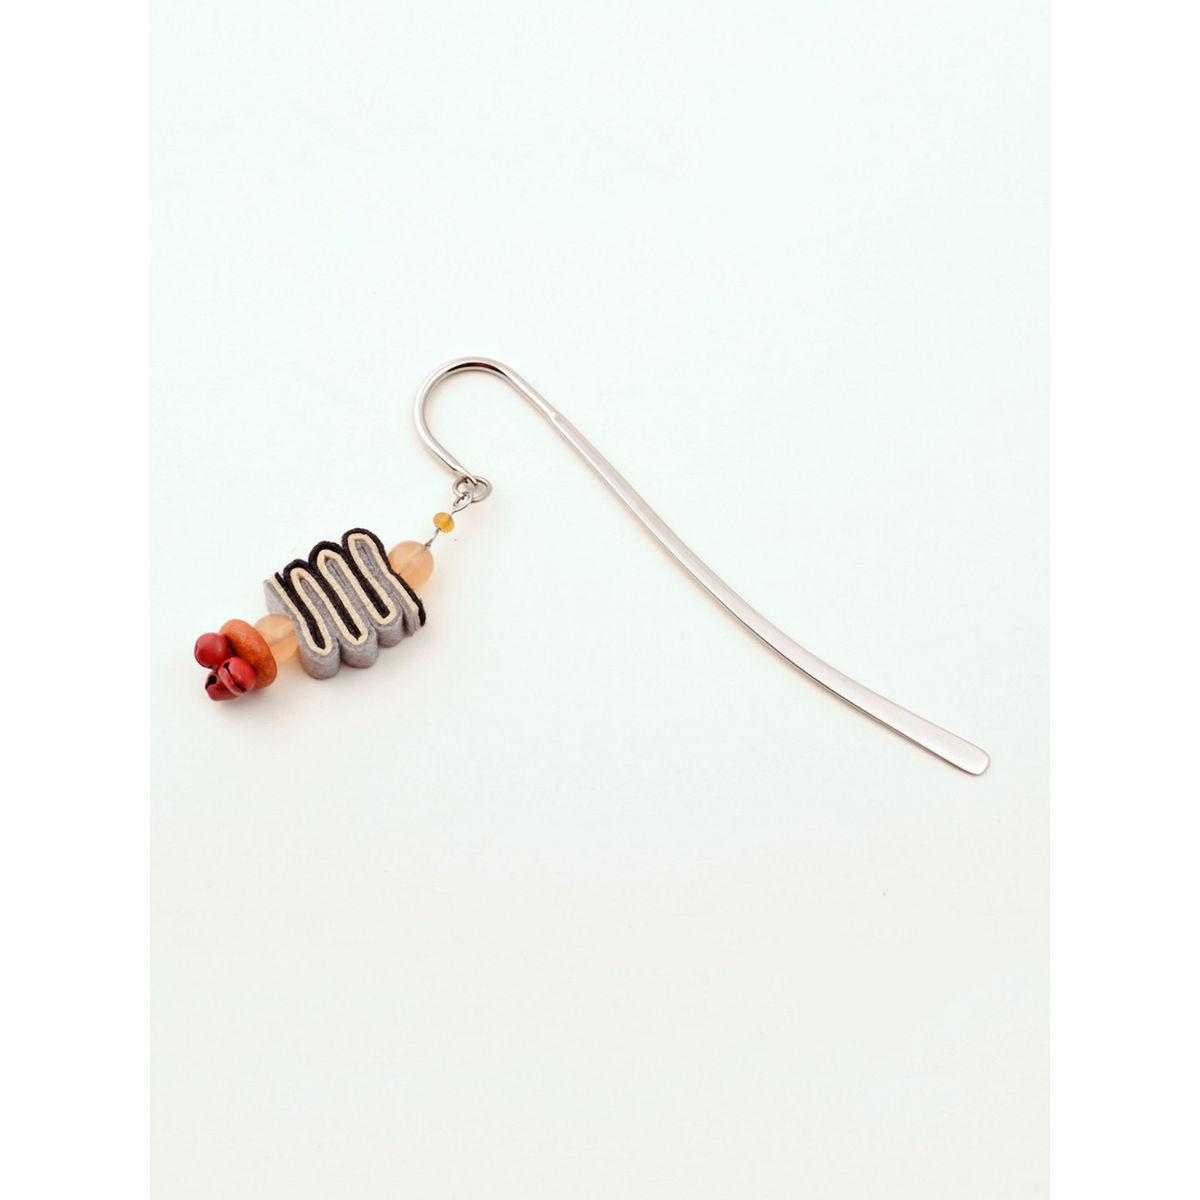 Bookworm Bookmark - Orange